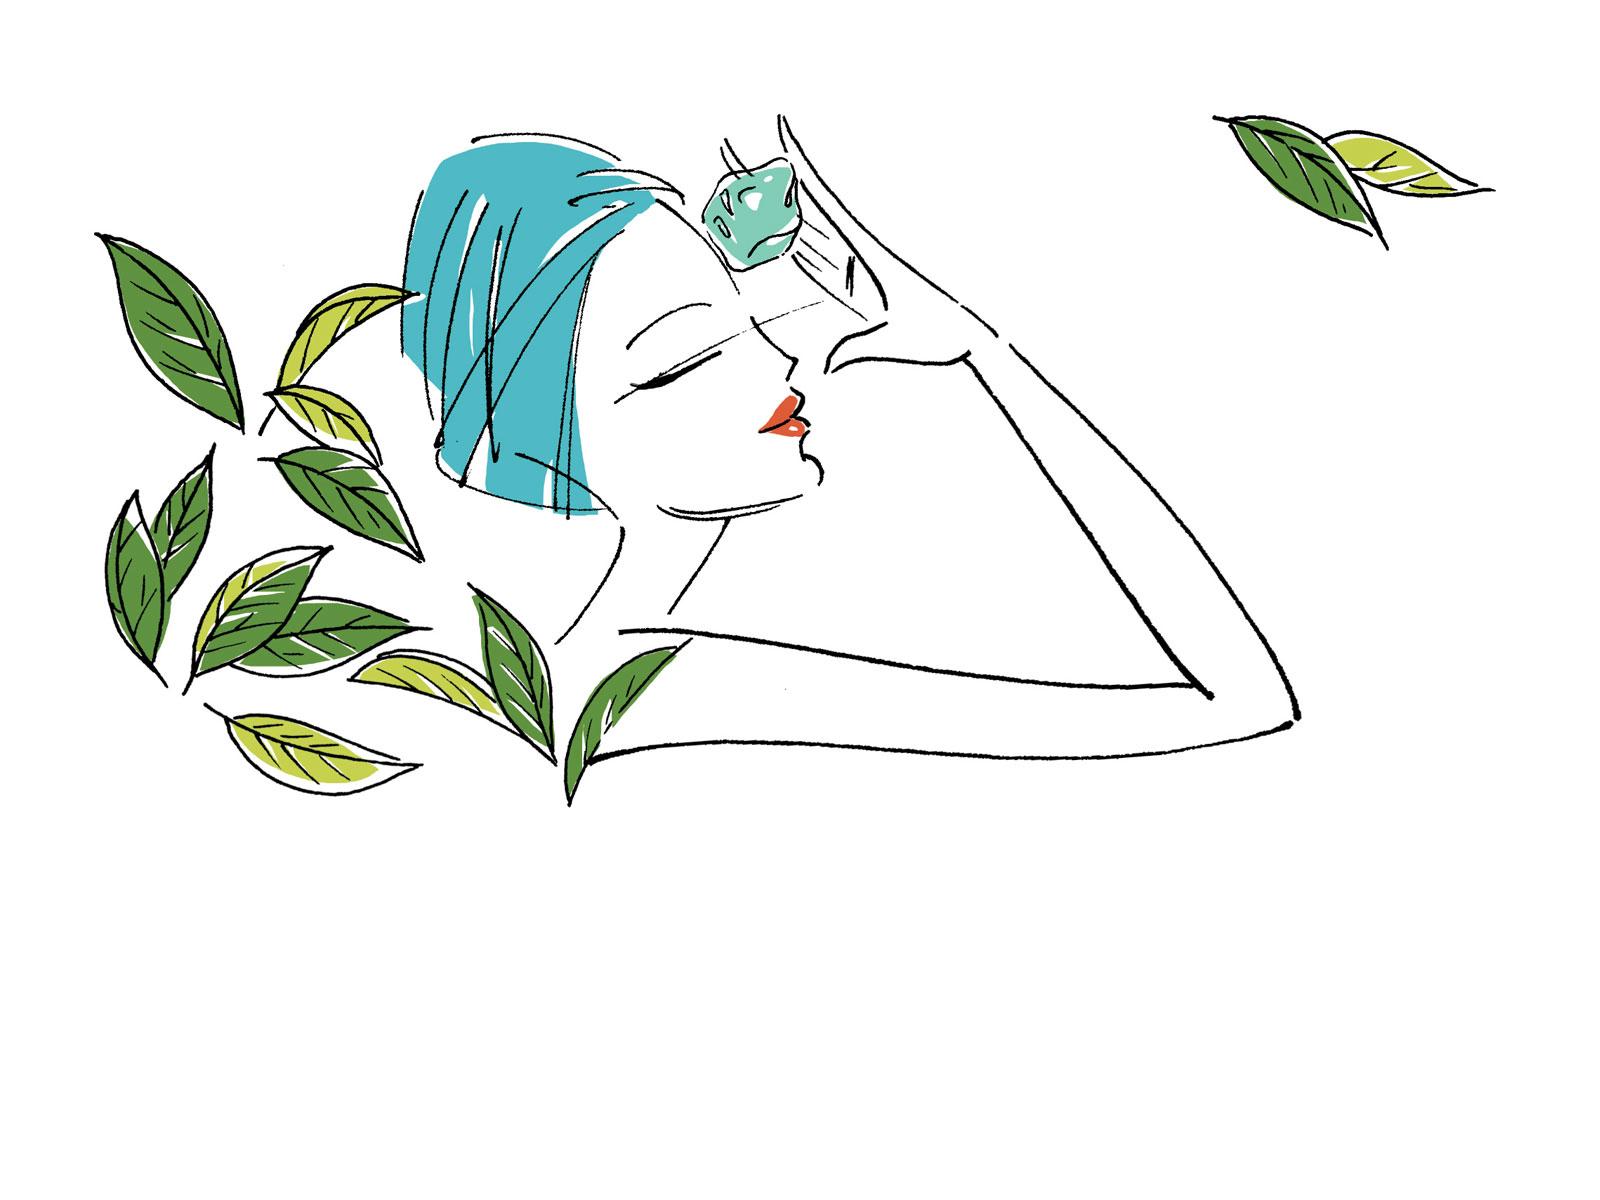 illustrations-beatricefavereau-9558